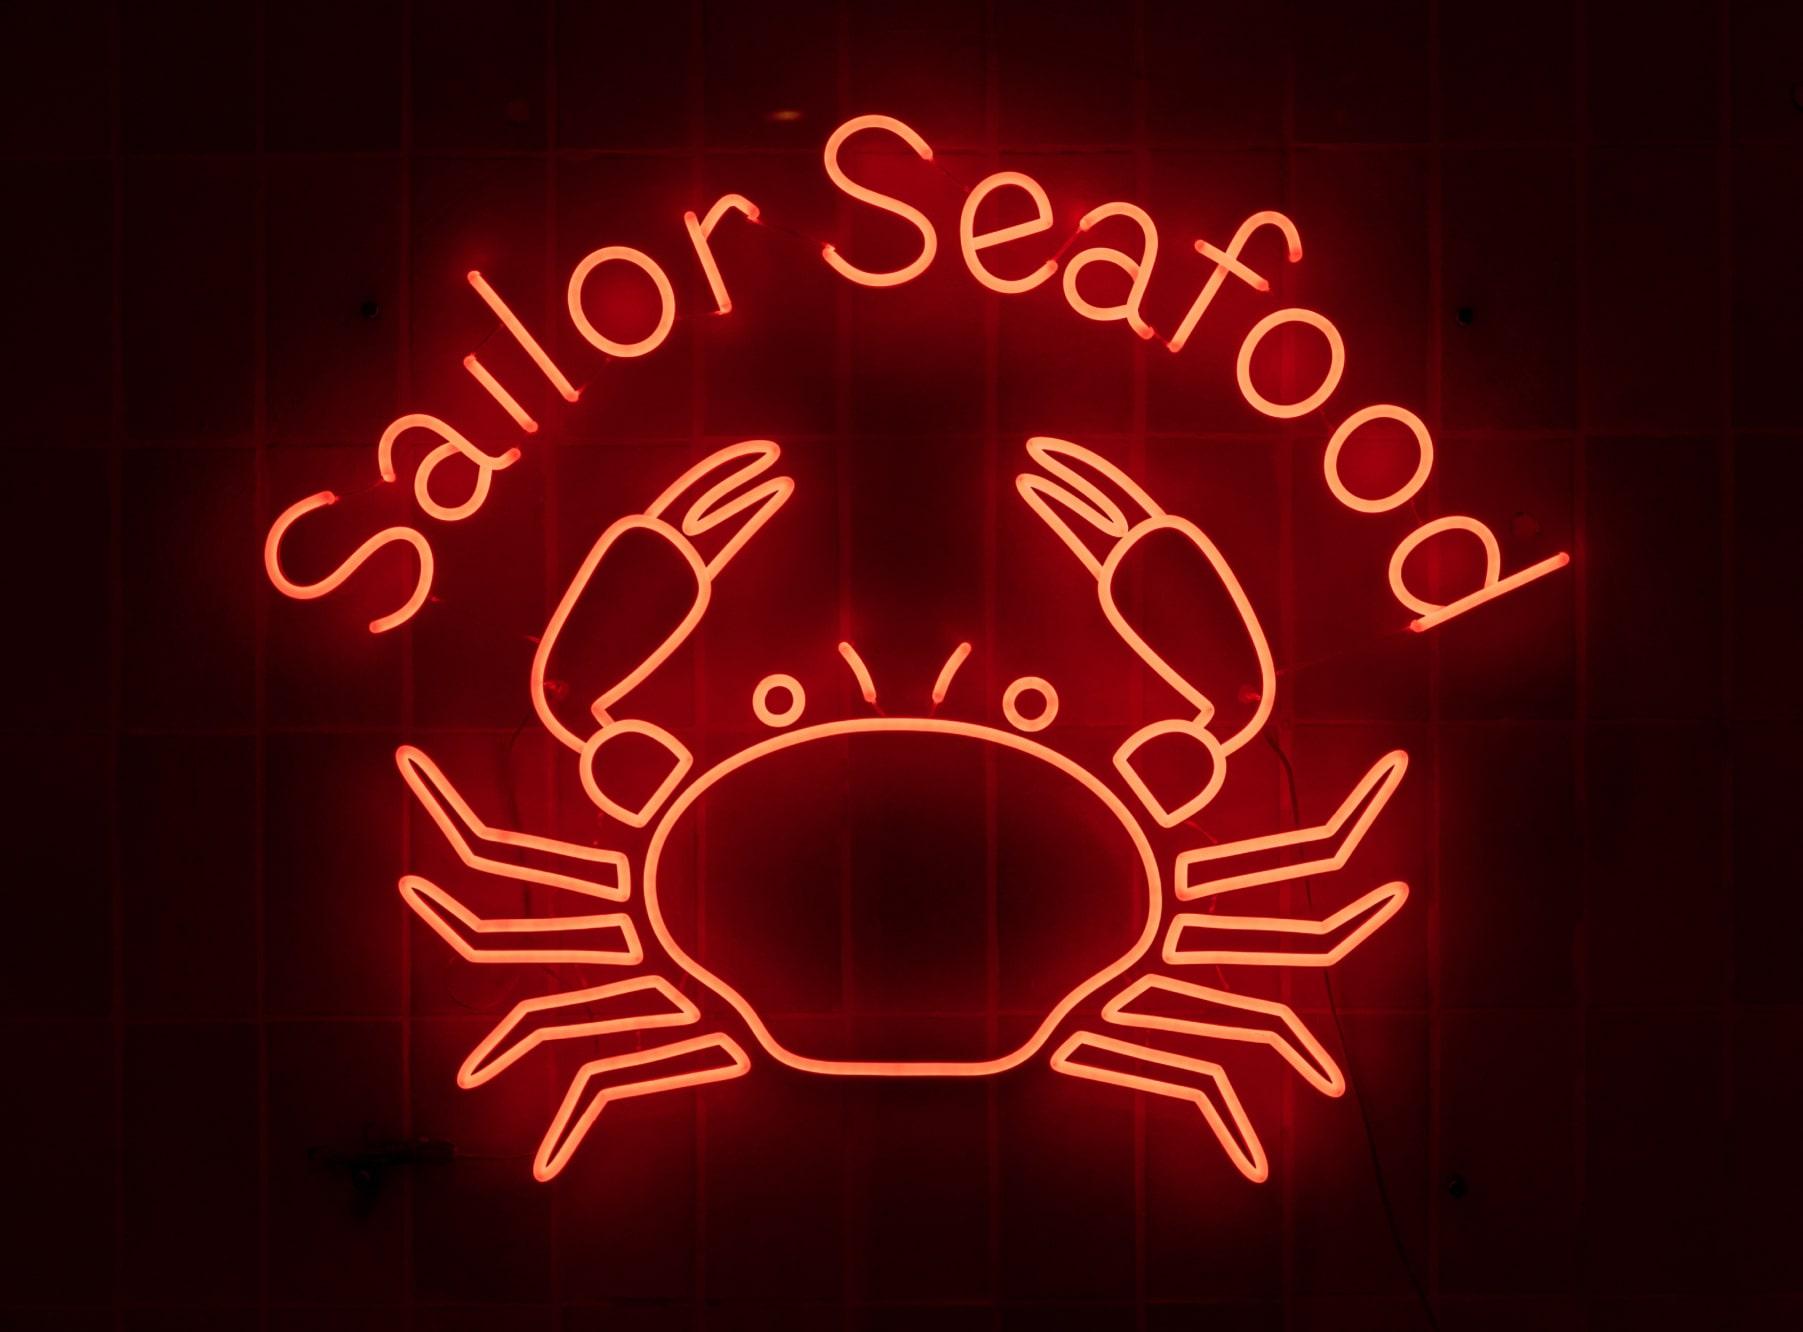 Sailor Seafood Instagram